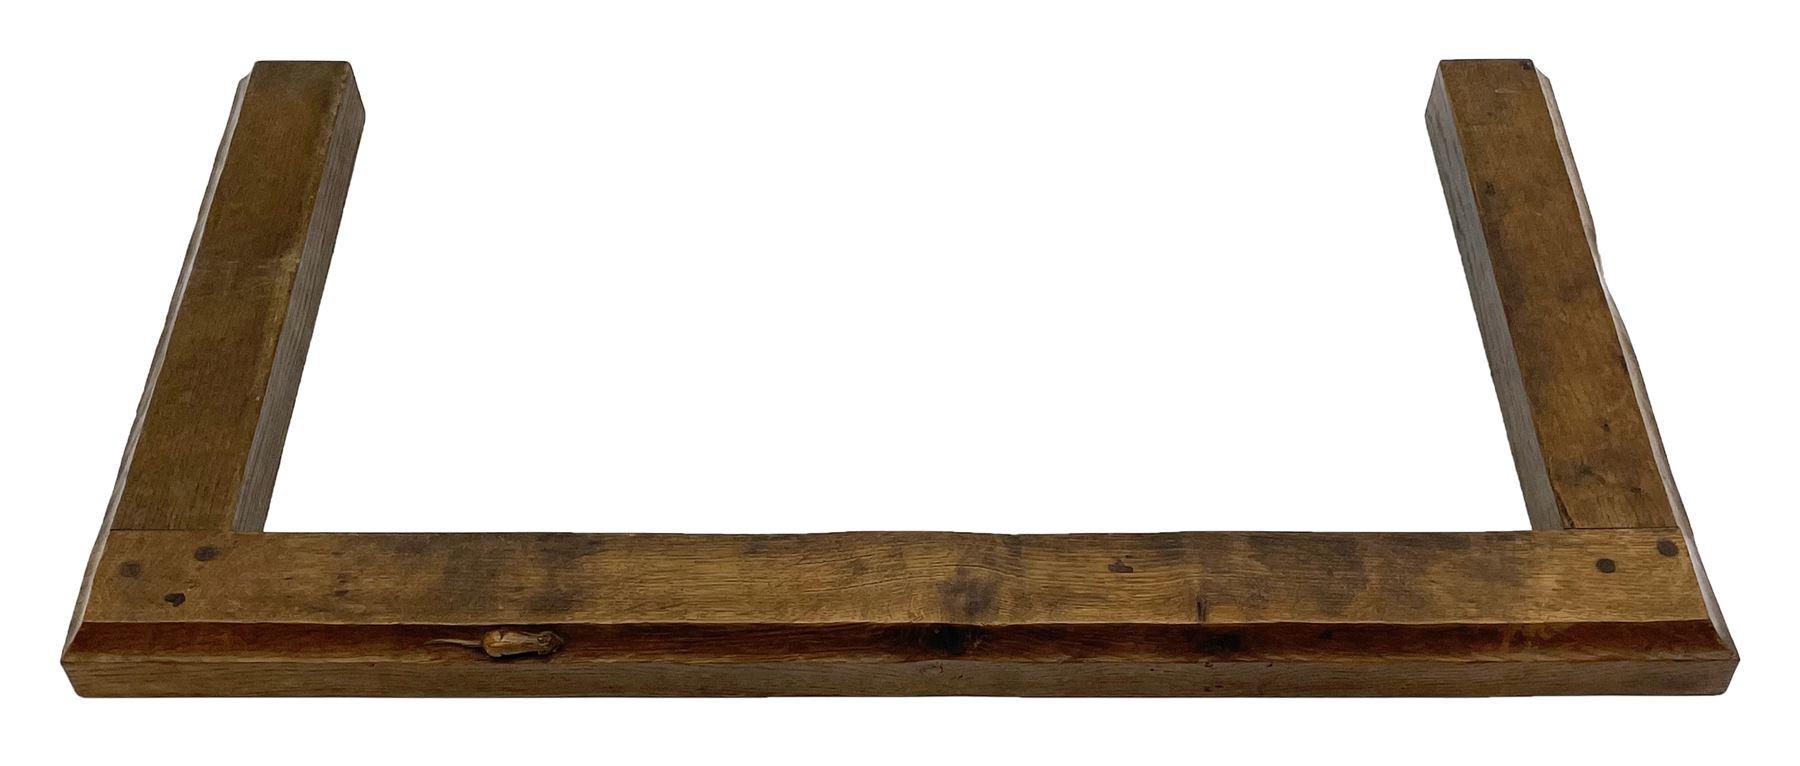 'Mouseman' 1930s/40s tooled oak fire fender